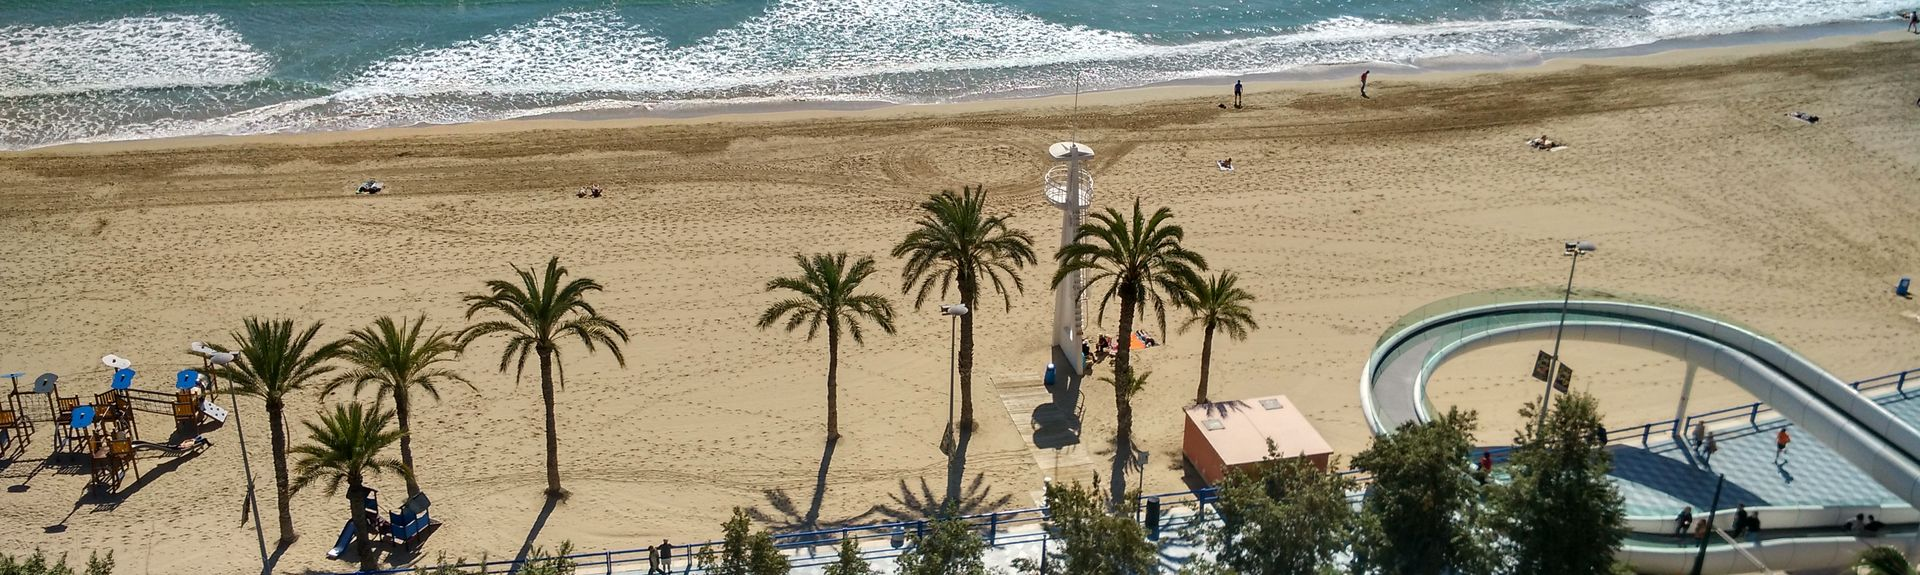 Barri Vell - Santa Creu, Alicante, Comunitat Valenciana, Spanien